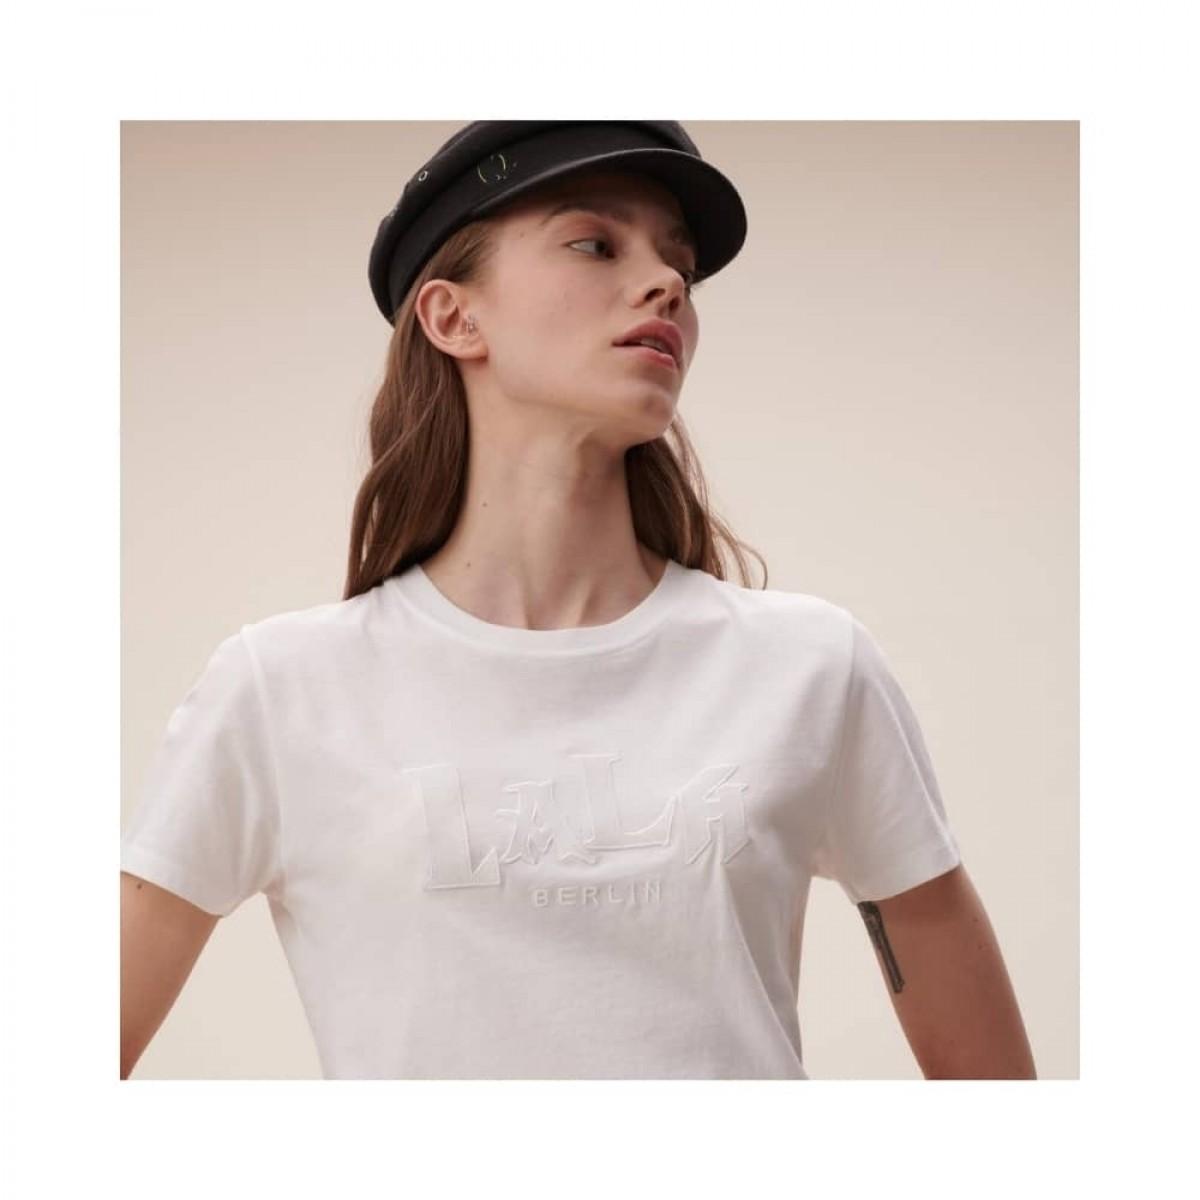 t-shirt reda lala mix - white - model broderi